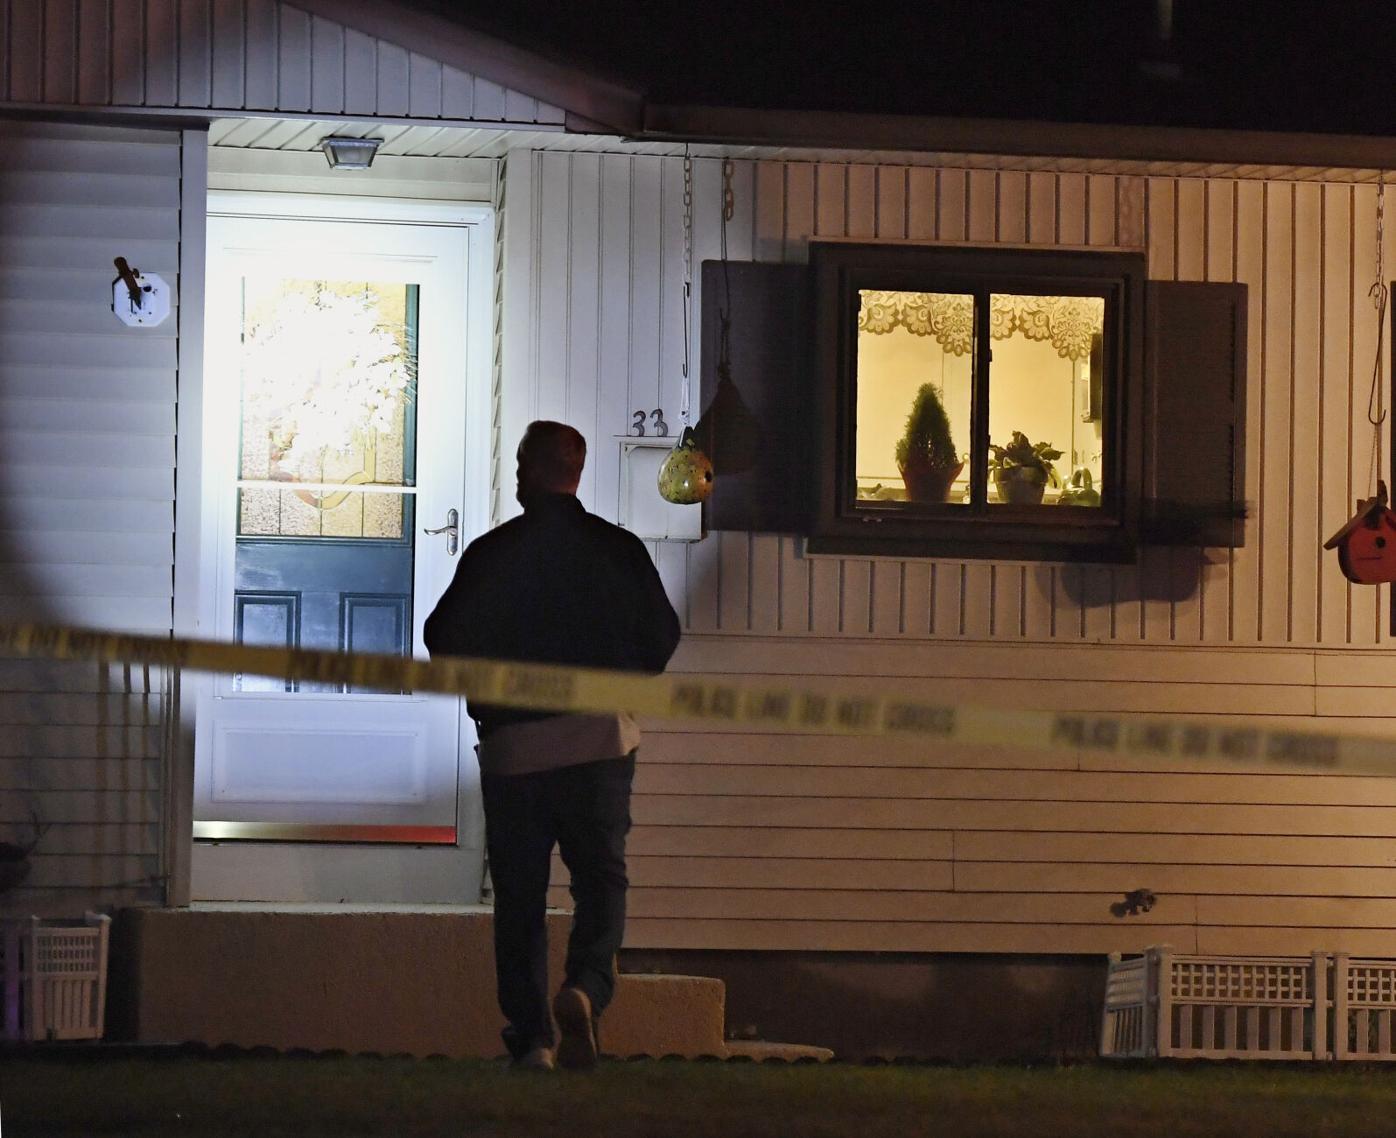 33 Dale St Windsor Locks Christmas night Police Investigation 001  .jpg